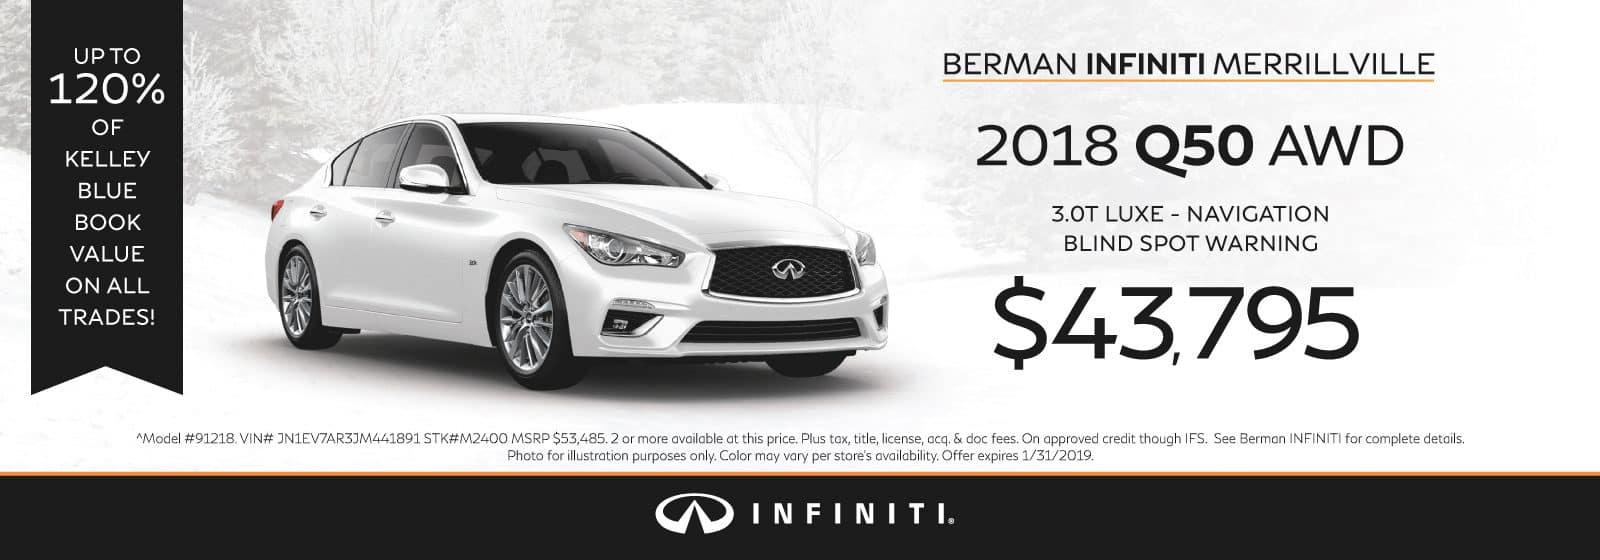 New 2018 INFINITI Q50 January Offer at Berman INFINITI of Merrillville!